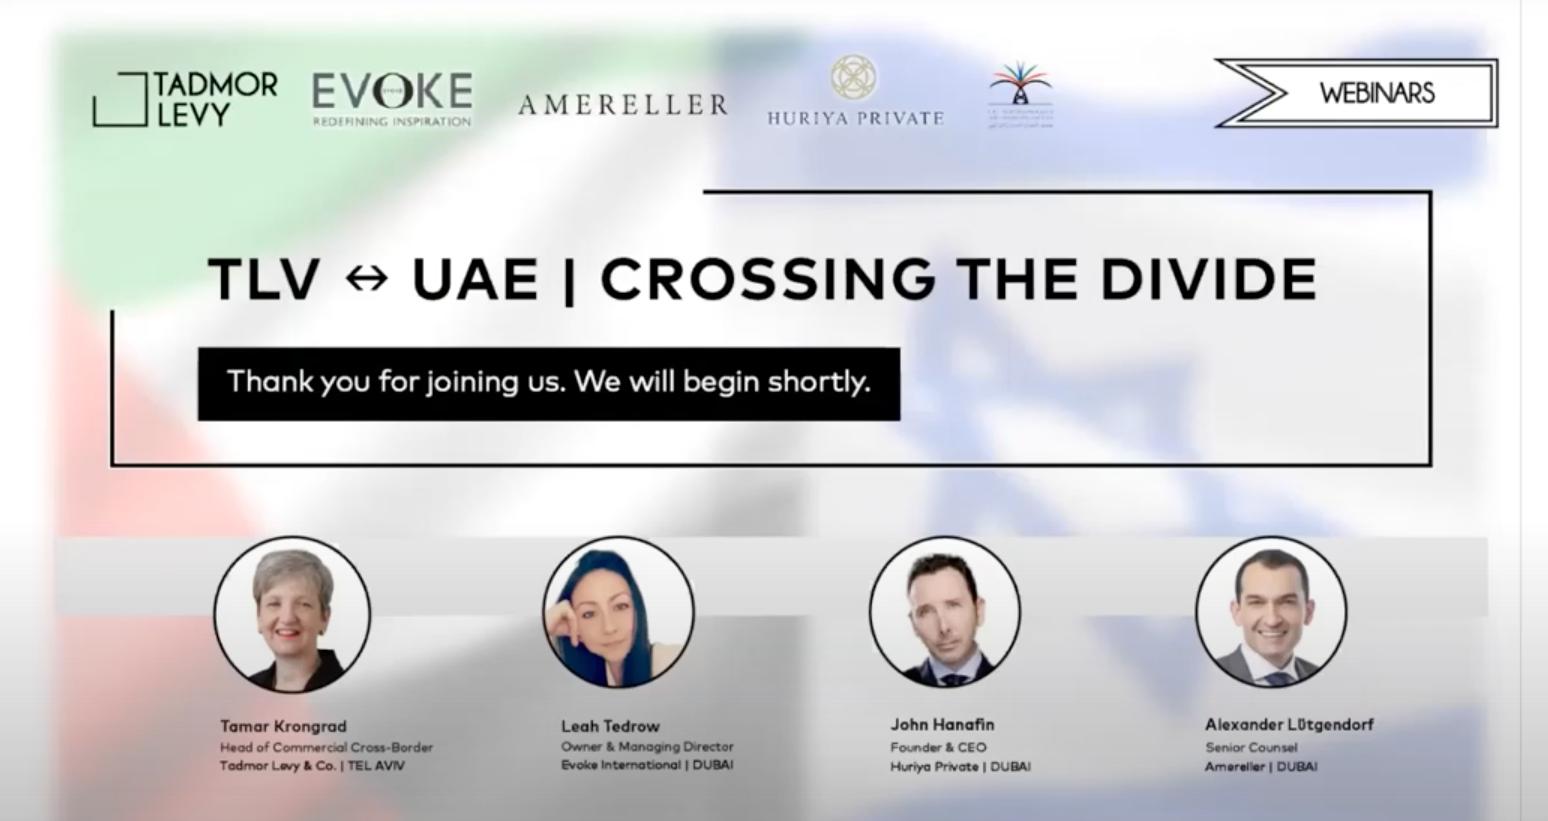 Evoke International Dubai - PR, Strategic Communication, Marketing, Design